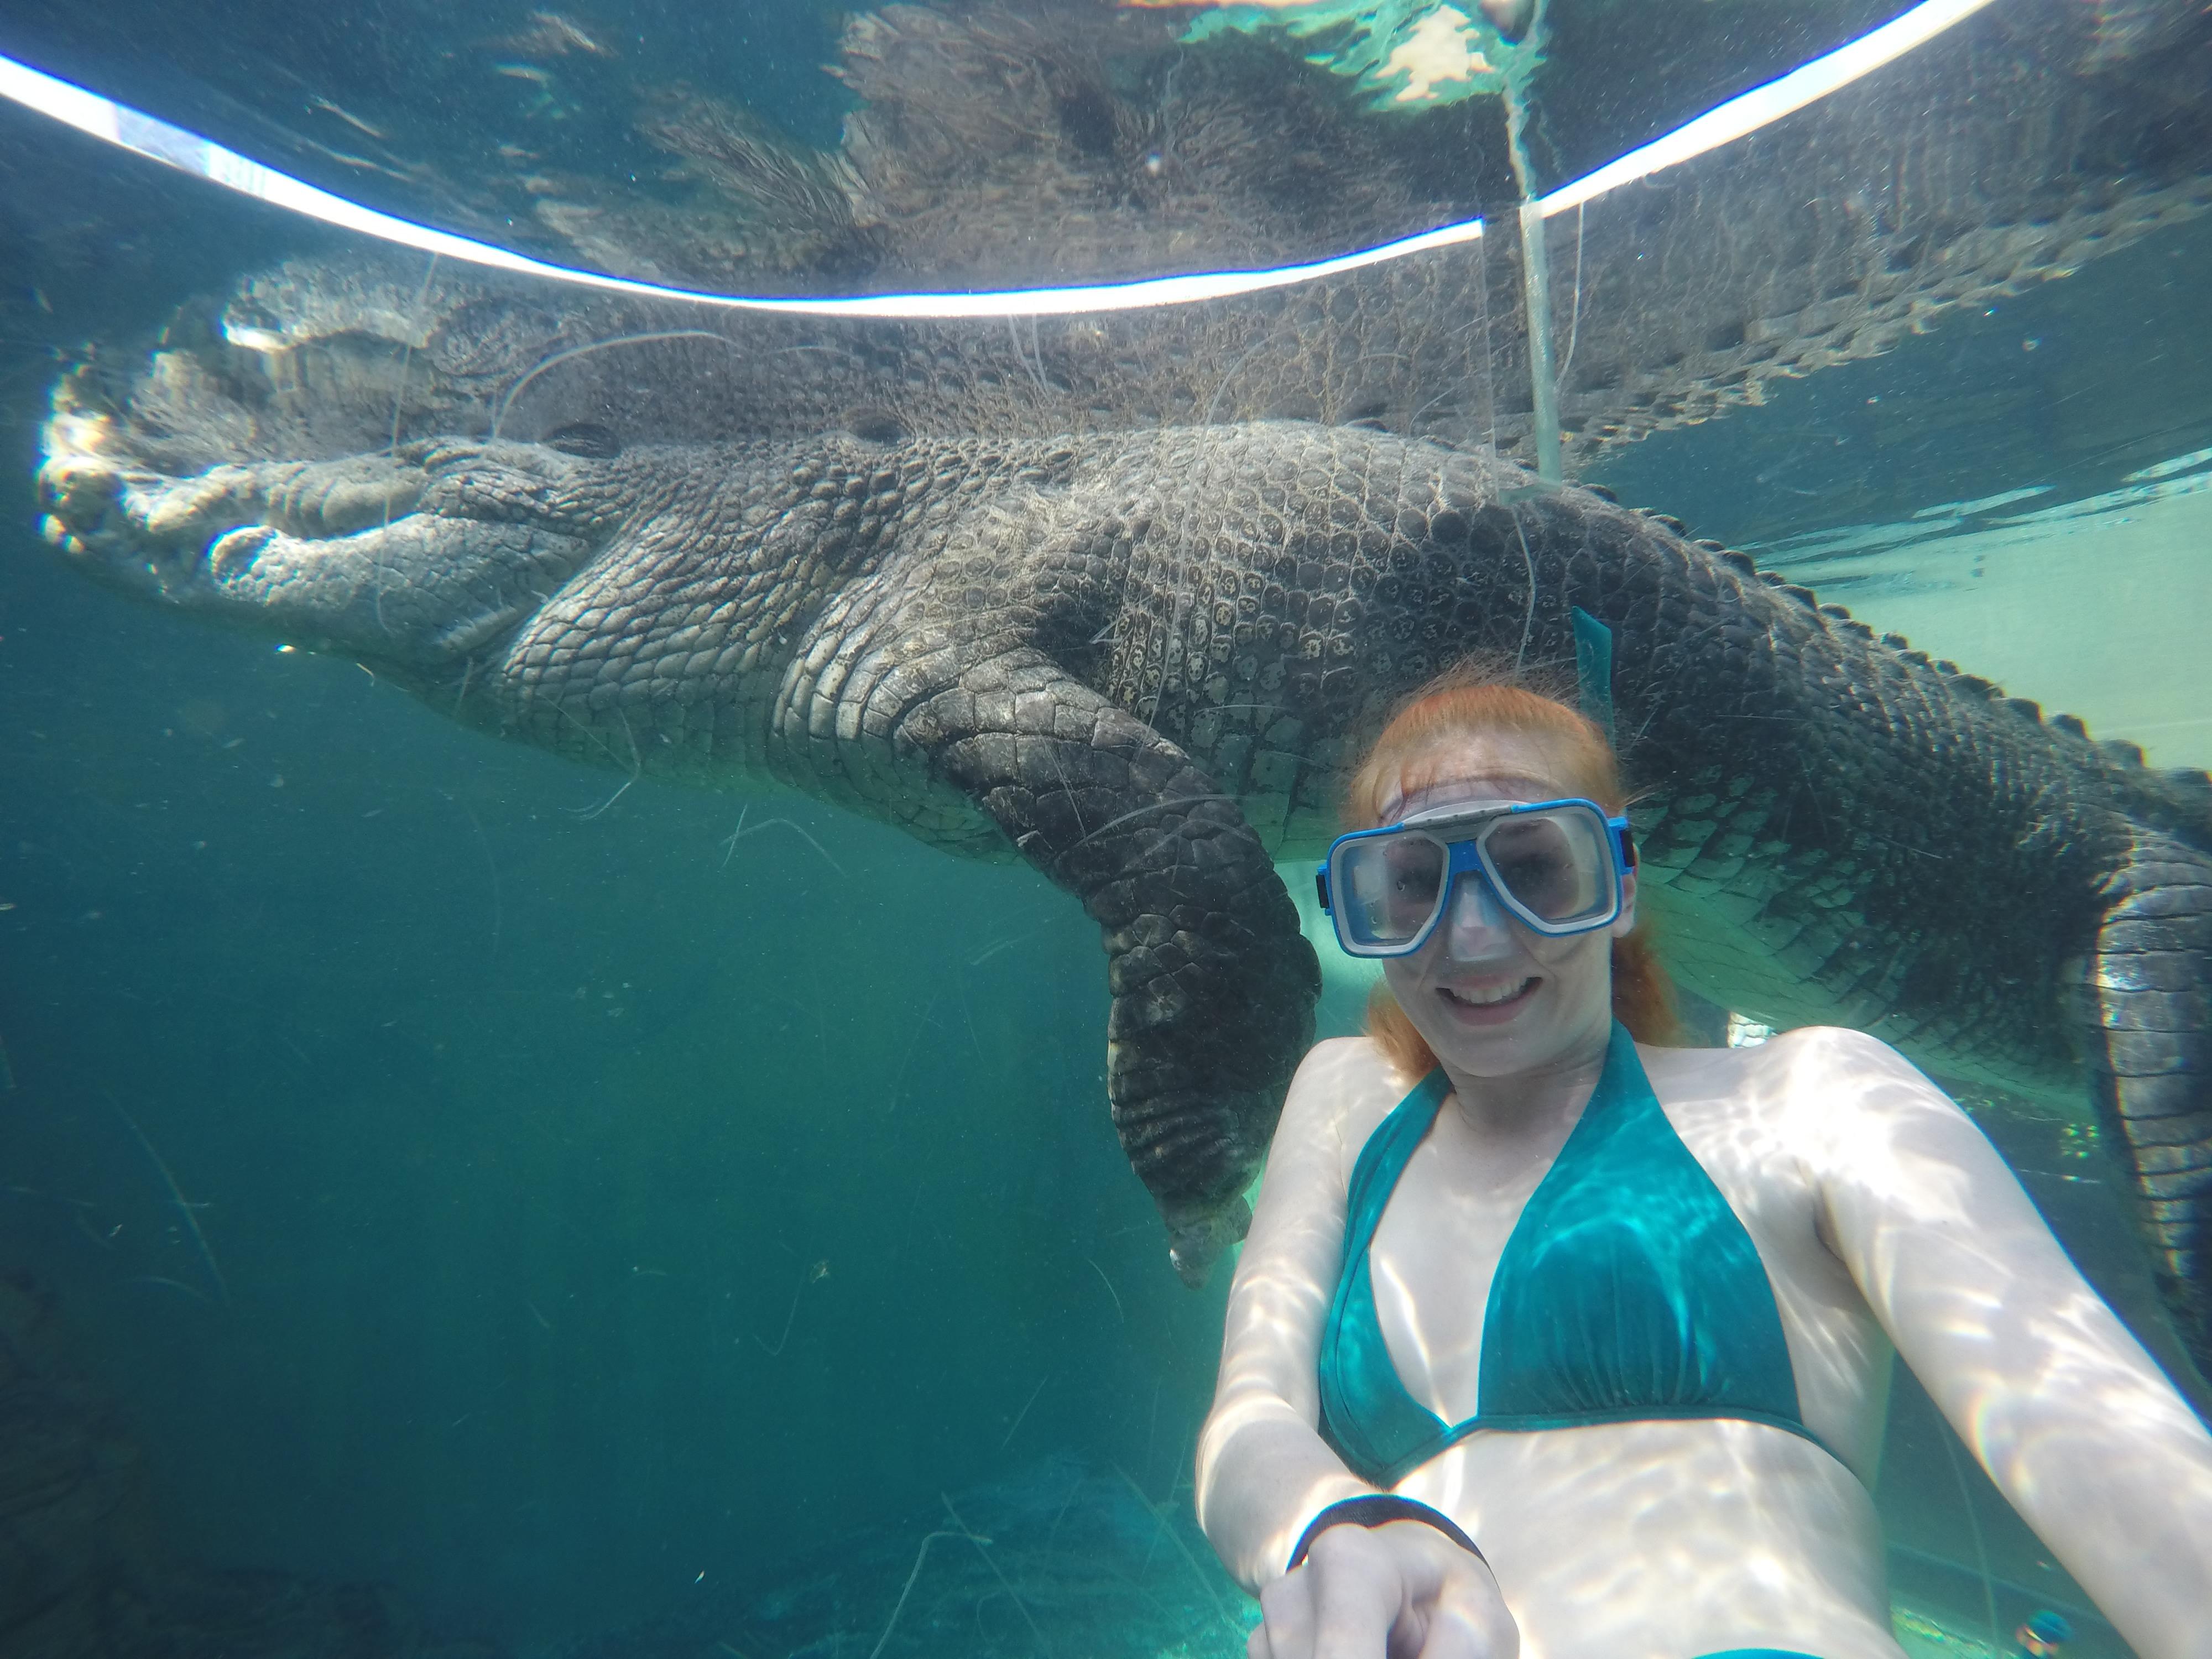 crocodile-croc-swim-adventure-thrill-darwin-crocos21